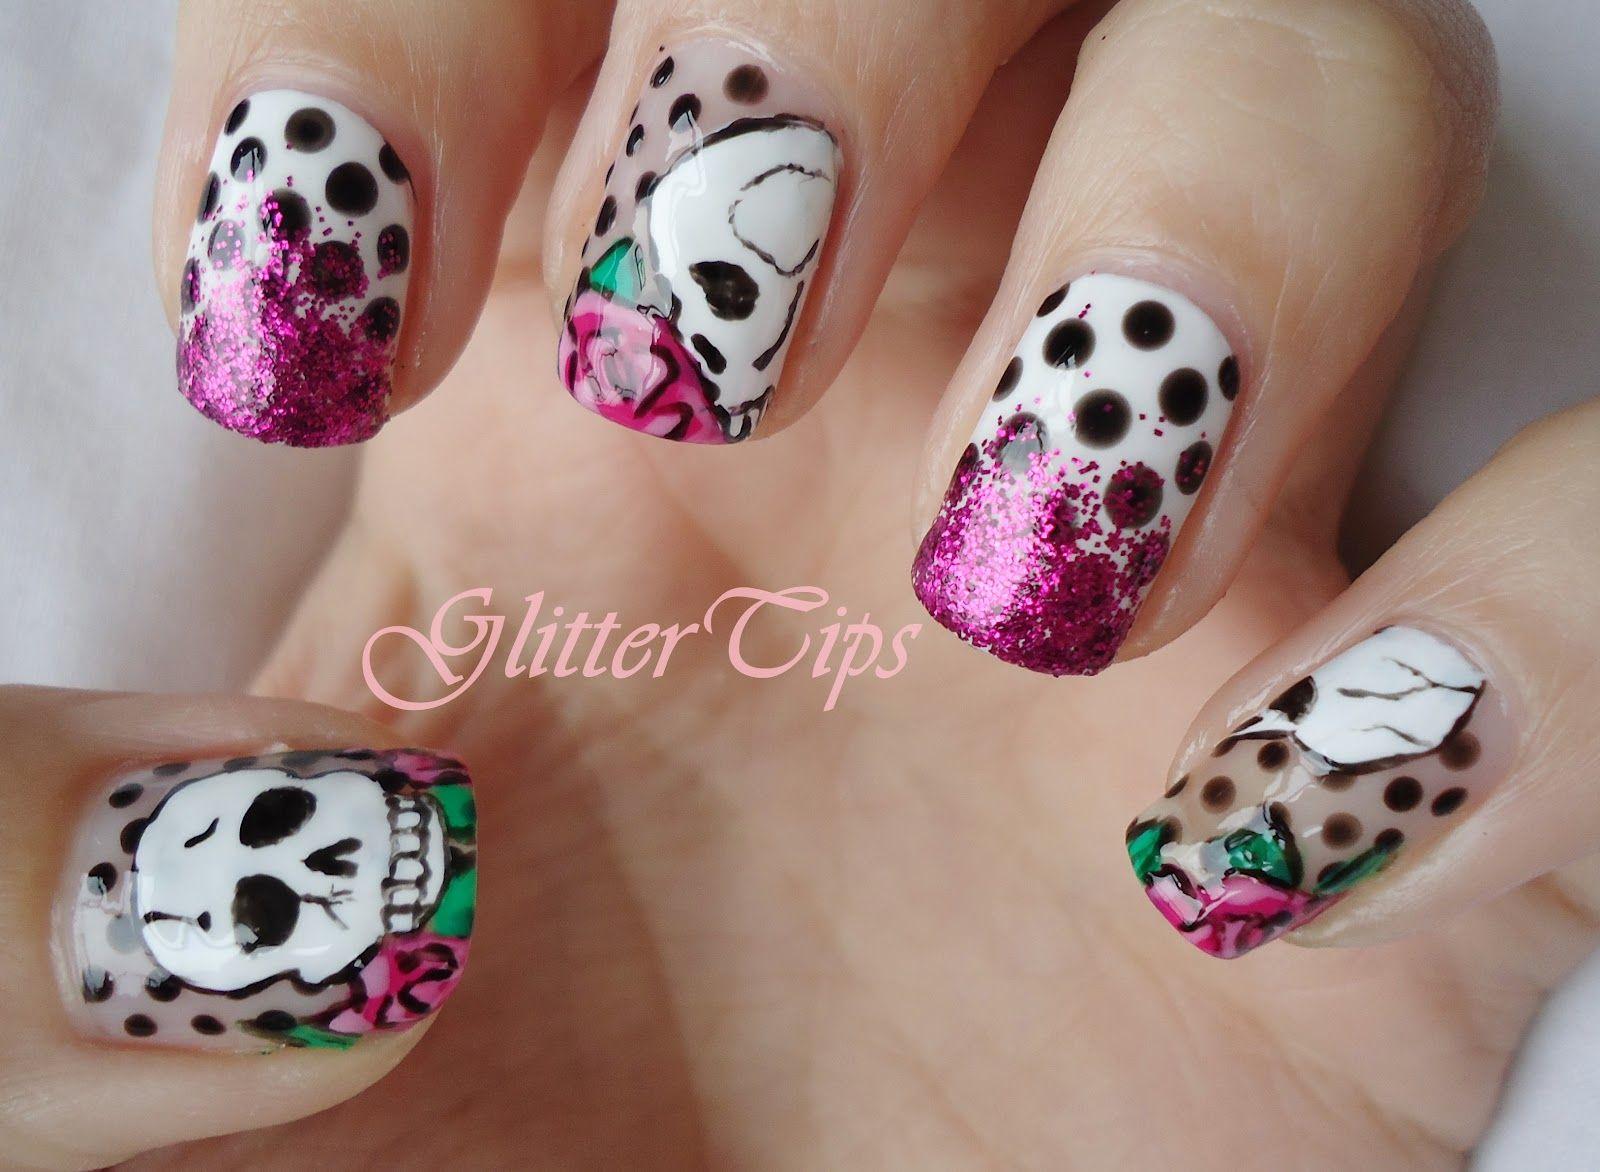 Skull nail designs | Get Yo Nails DID, Biiihhh | Pinterest | Skull ...